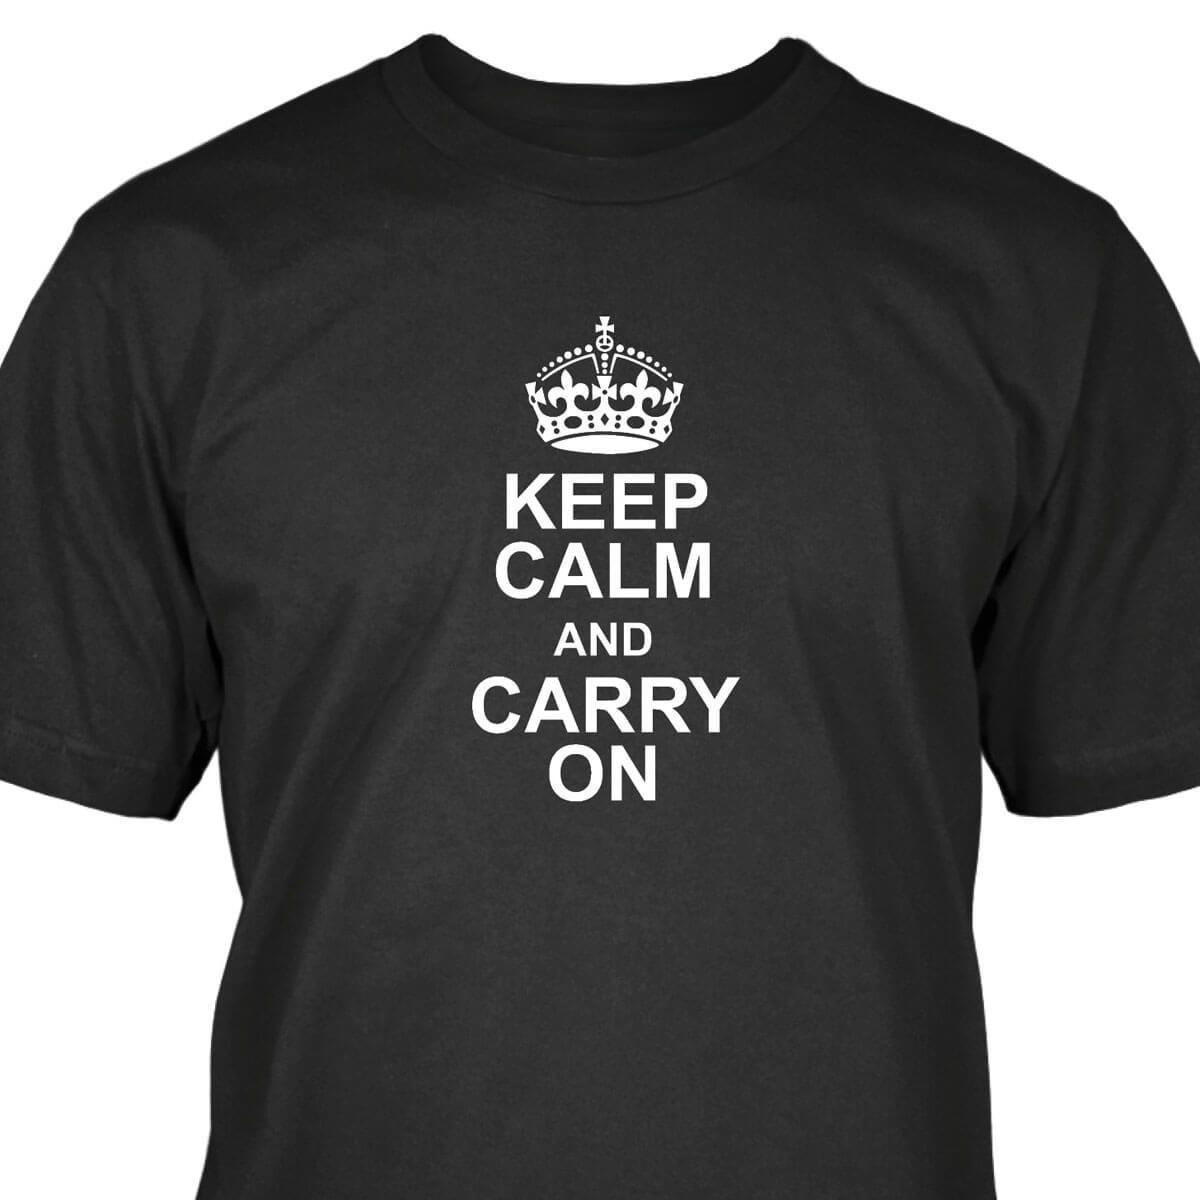 6cddfd52 Keep Calm And Carry On T Shirt Mens 2018 Fashion Brand T Shirt O Neck  100%cotton T Shirt Tops Tee Custom Environmental Printed Comical T Shirts T  Shirt With ...